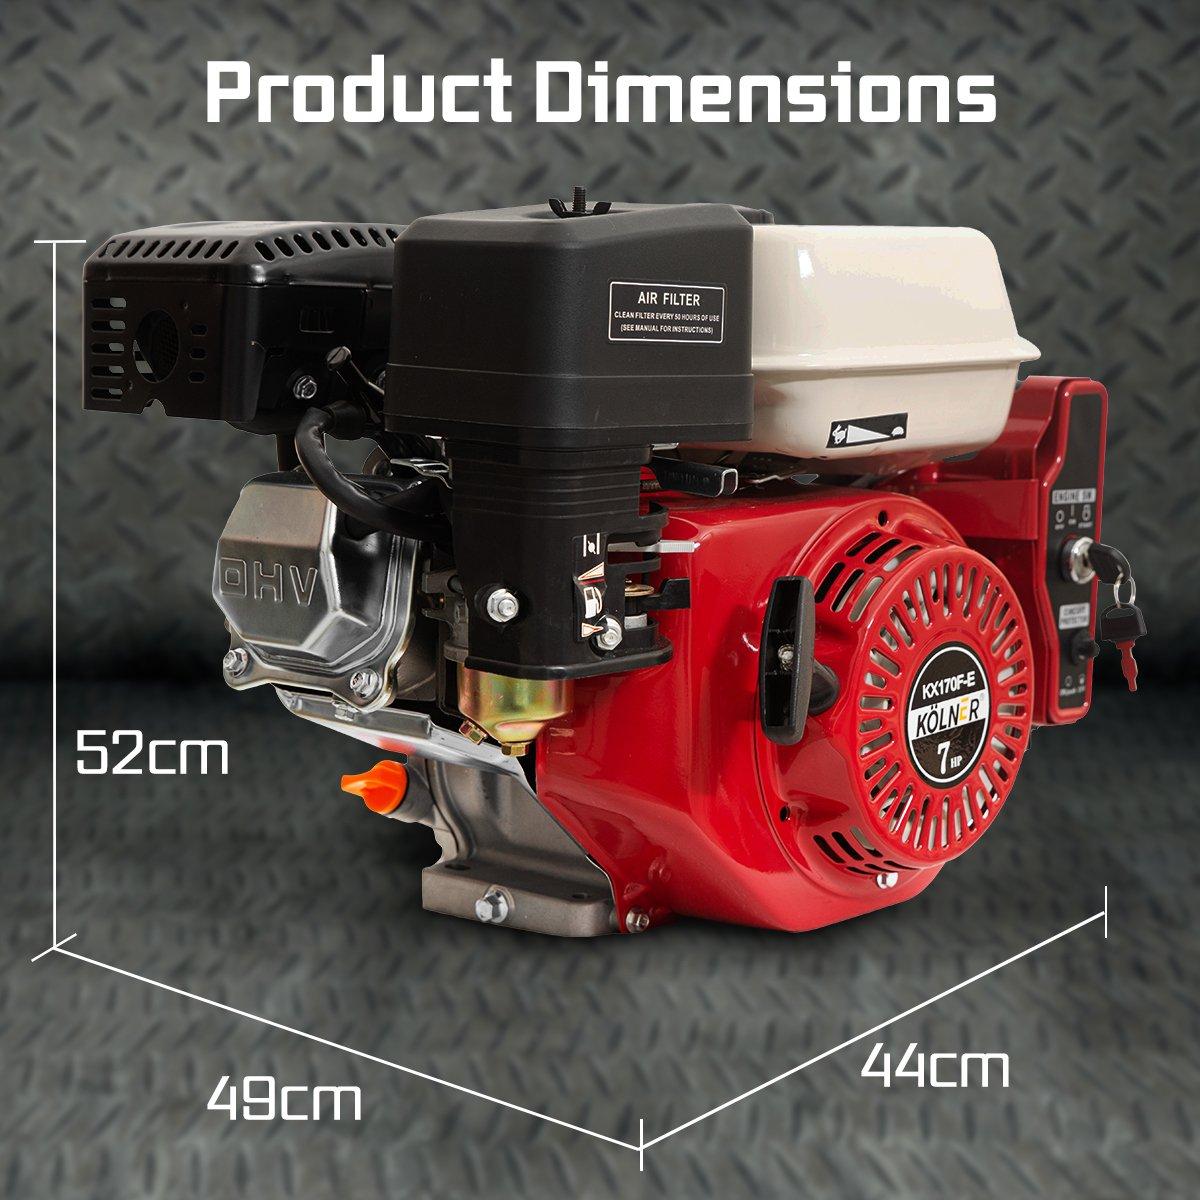 7HP Horizontal Key Shaft Q Type Petrol ENGINE - Electric Start